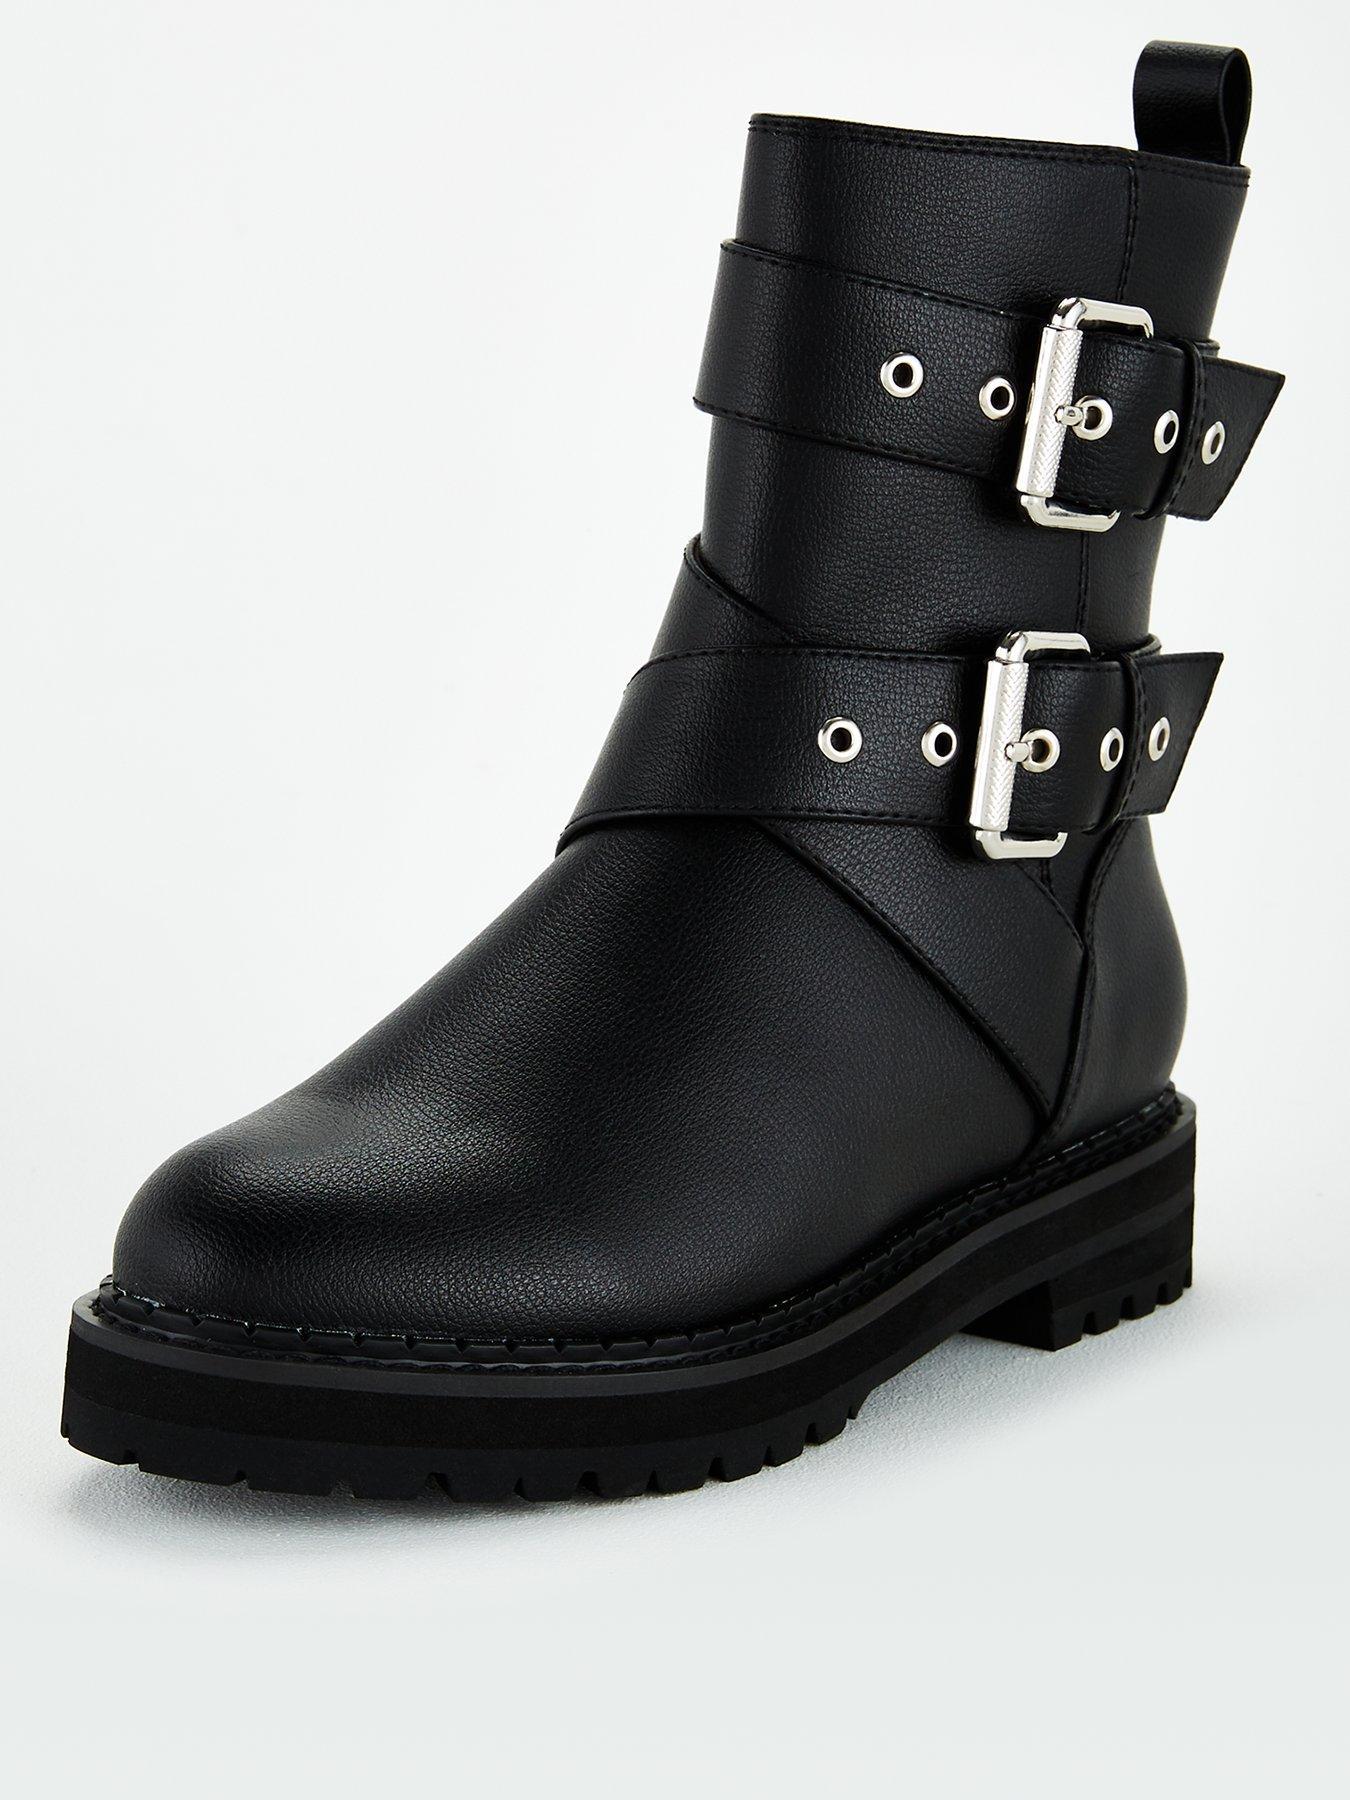 Ankle Boots   inc. Women's Chelsea